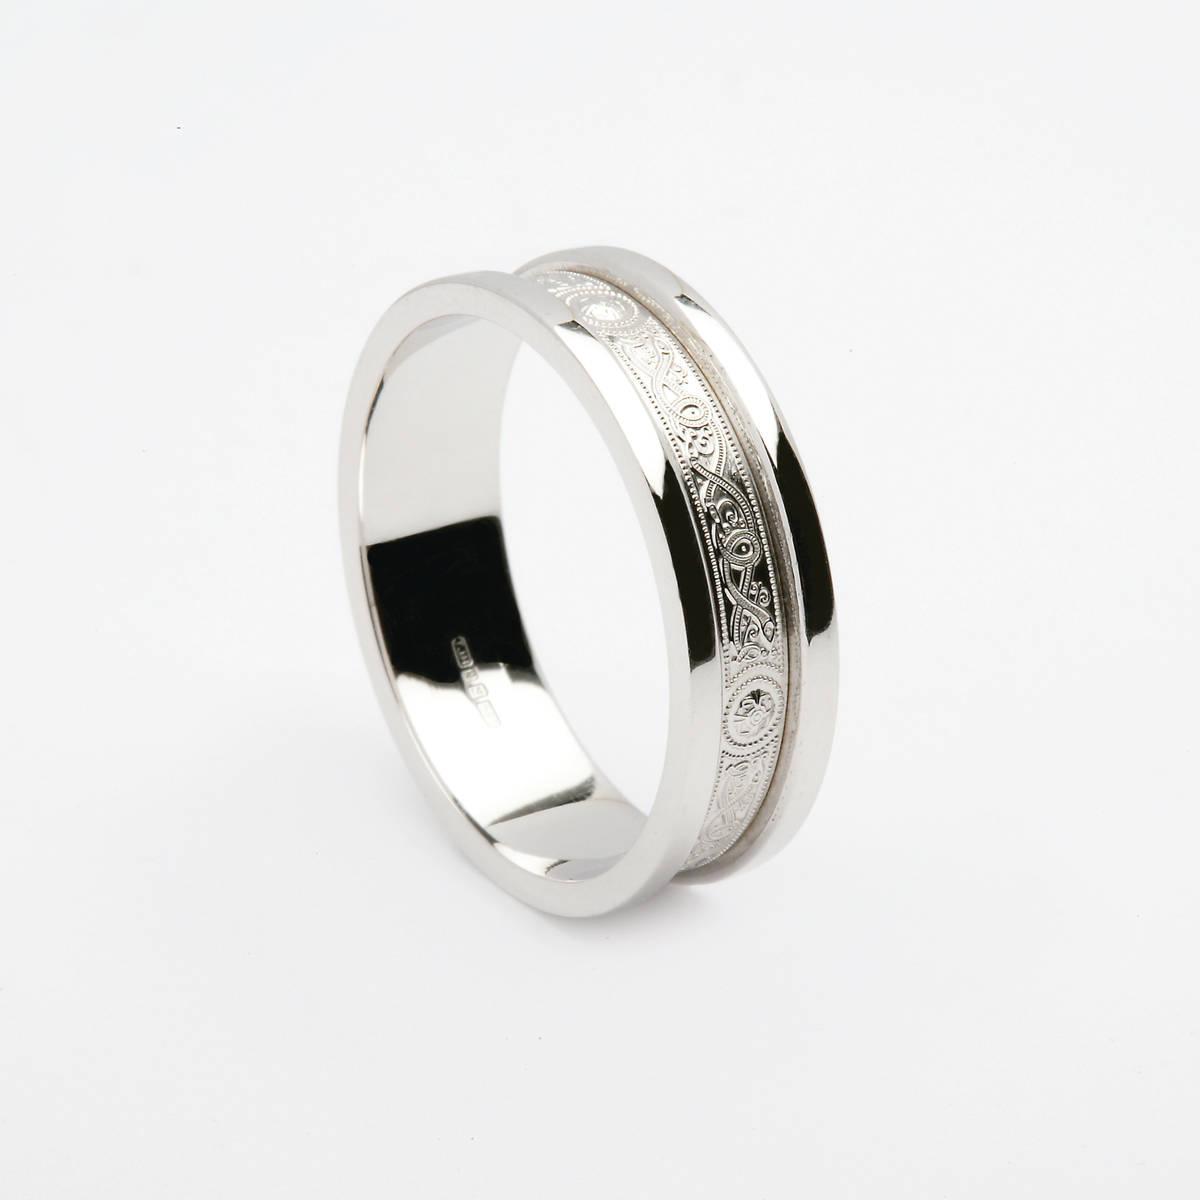 10 carat white gold Arda inspired unisex wedding ring with heavy flat rims 7.6mm